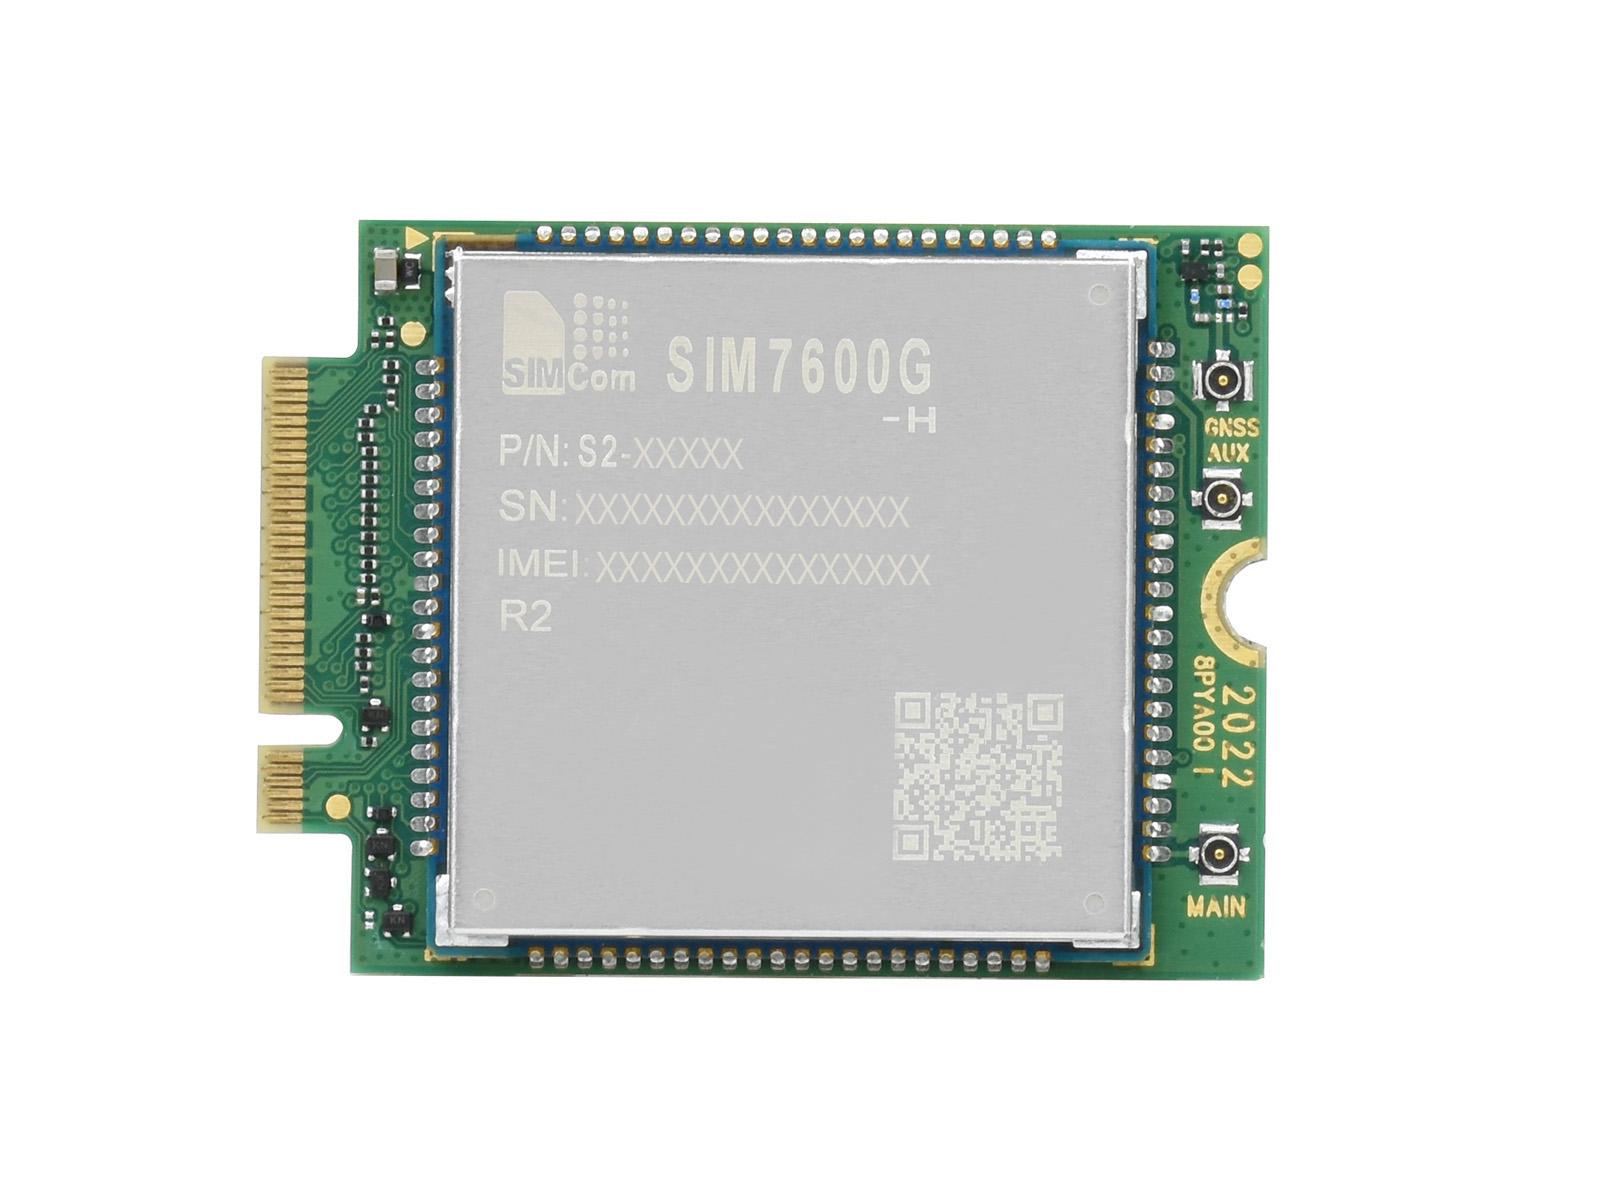 SIMCom原装4G全球通用SIM7600G-H M.2接口GNSS全球定位无线通讯模块LTE Cat-4模组